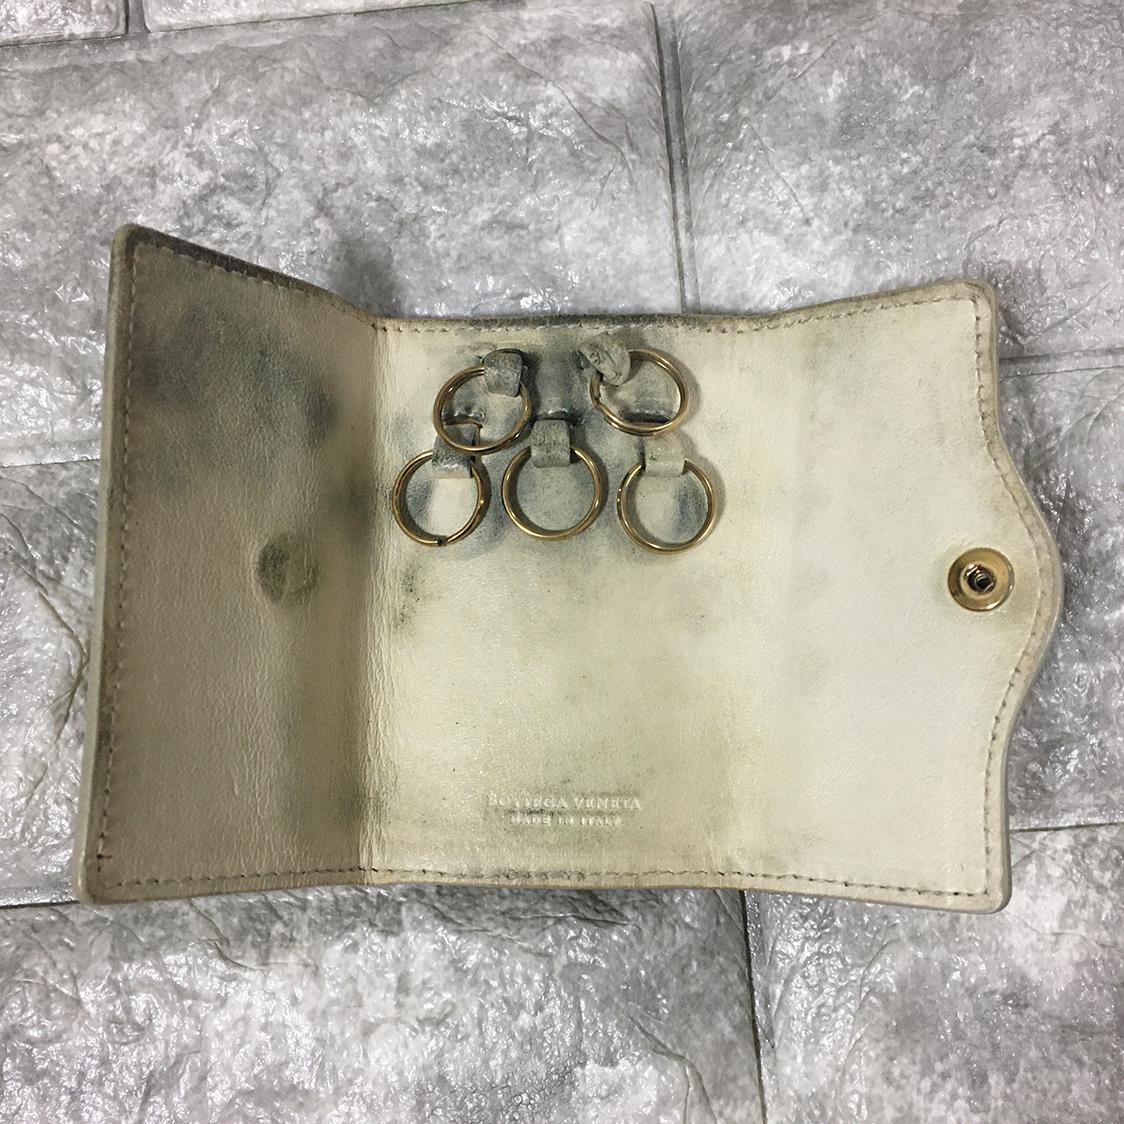 BOTTEGA VENETA ボッテガヴェネタ キーケース - イントレチャート レザー ホワイト 5連フック 財布